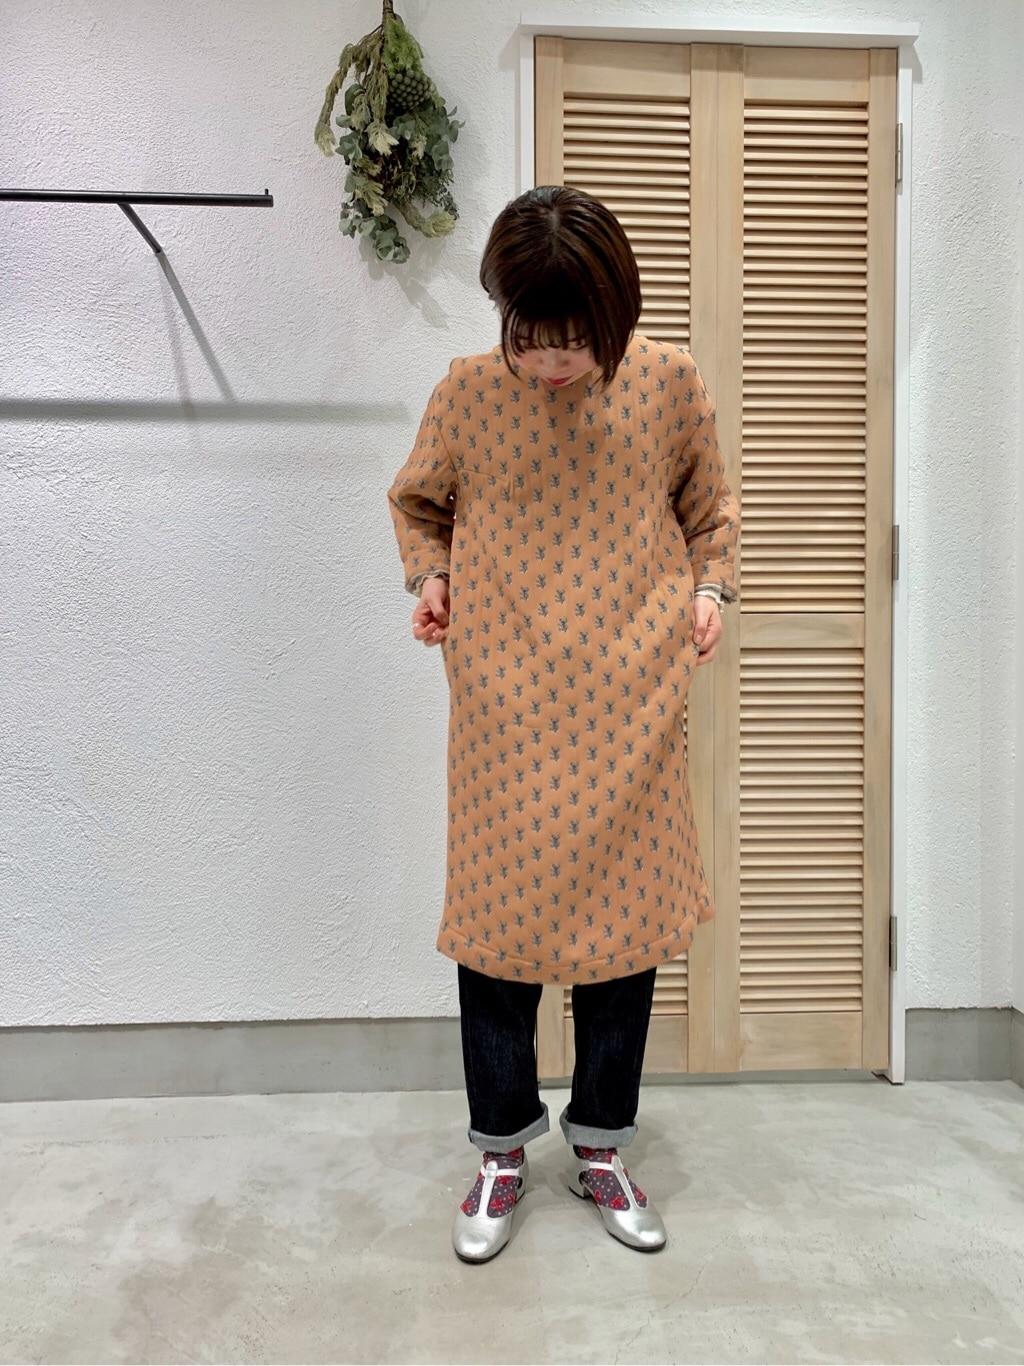 chambre de charme 横浜ジョイナス 身長:153cm 2020.02.26